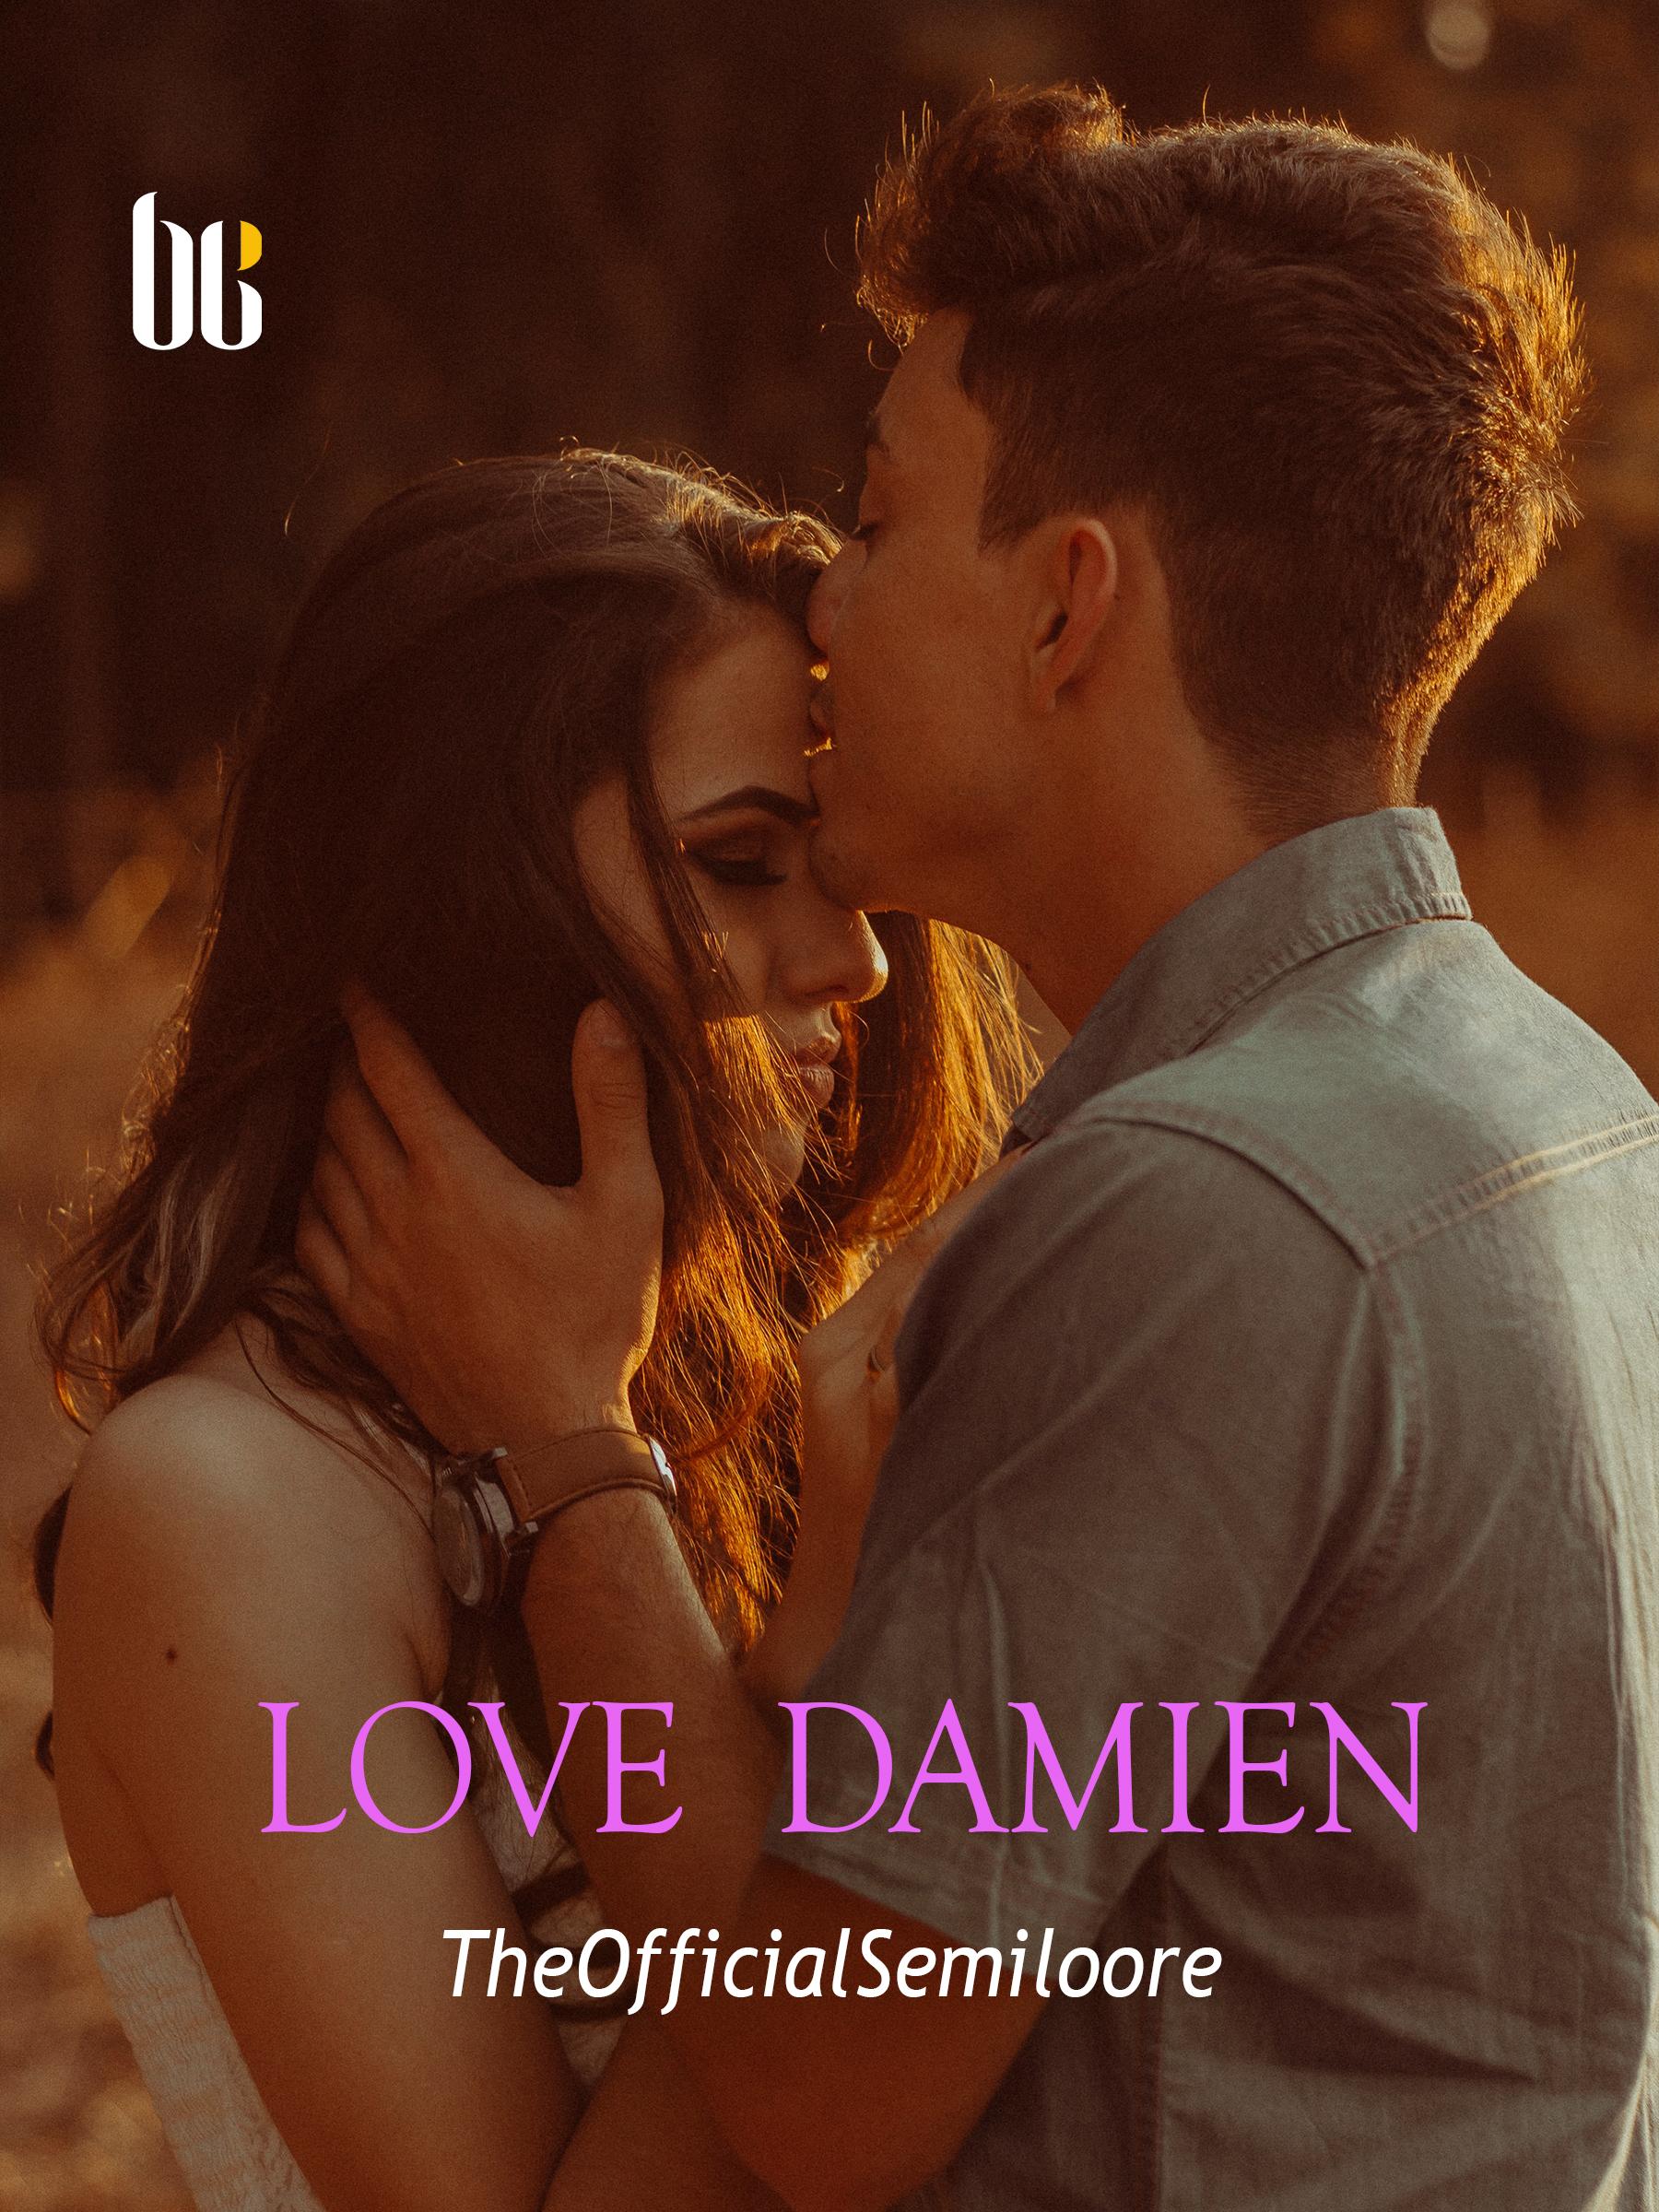 Love Damien